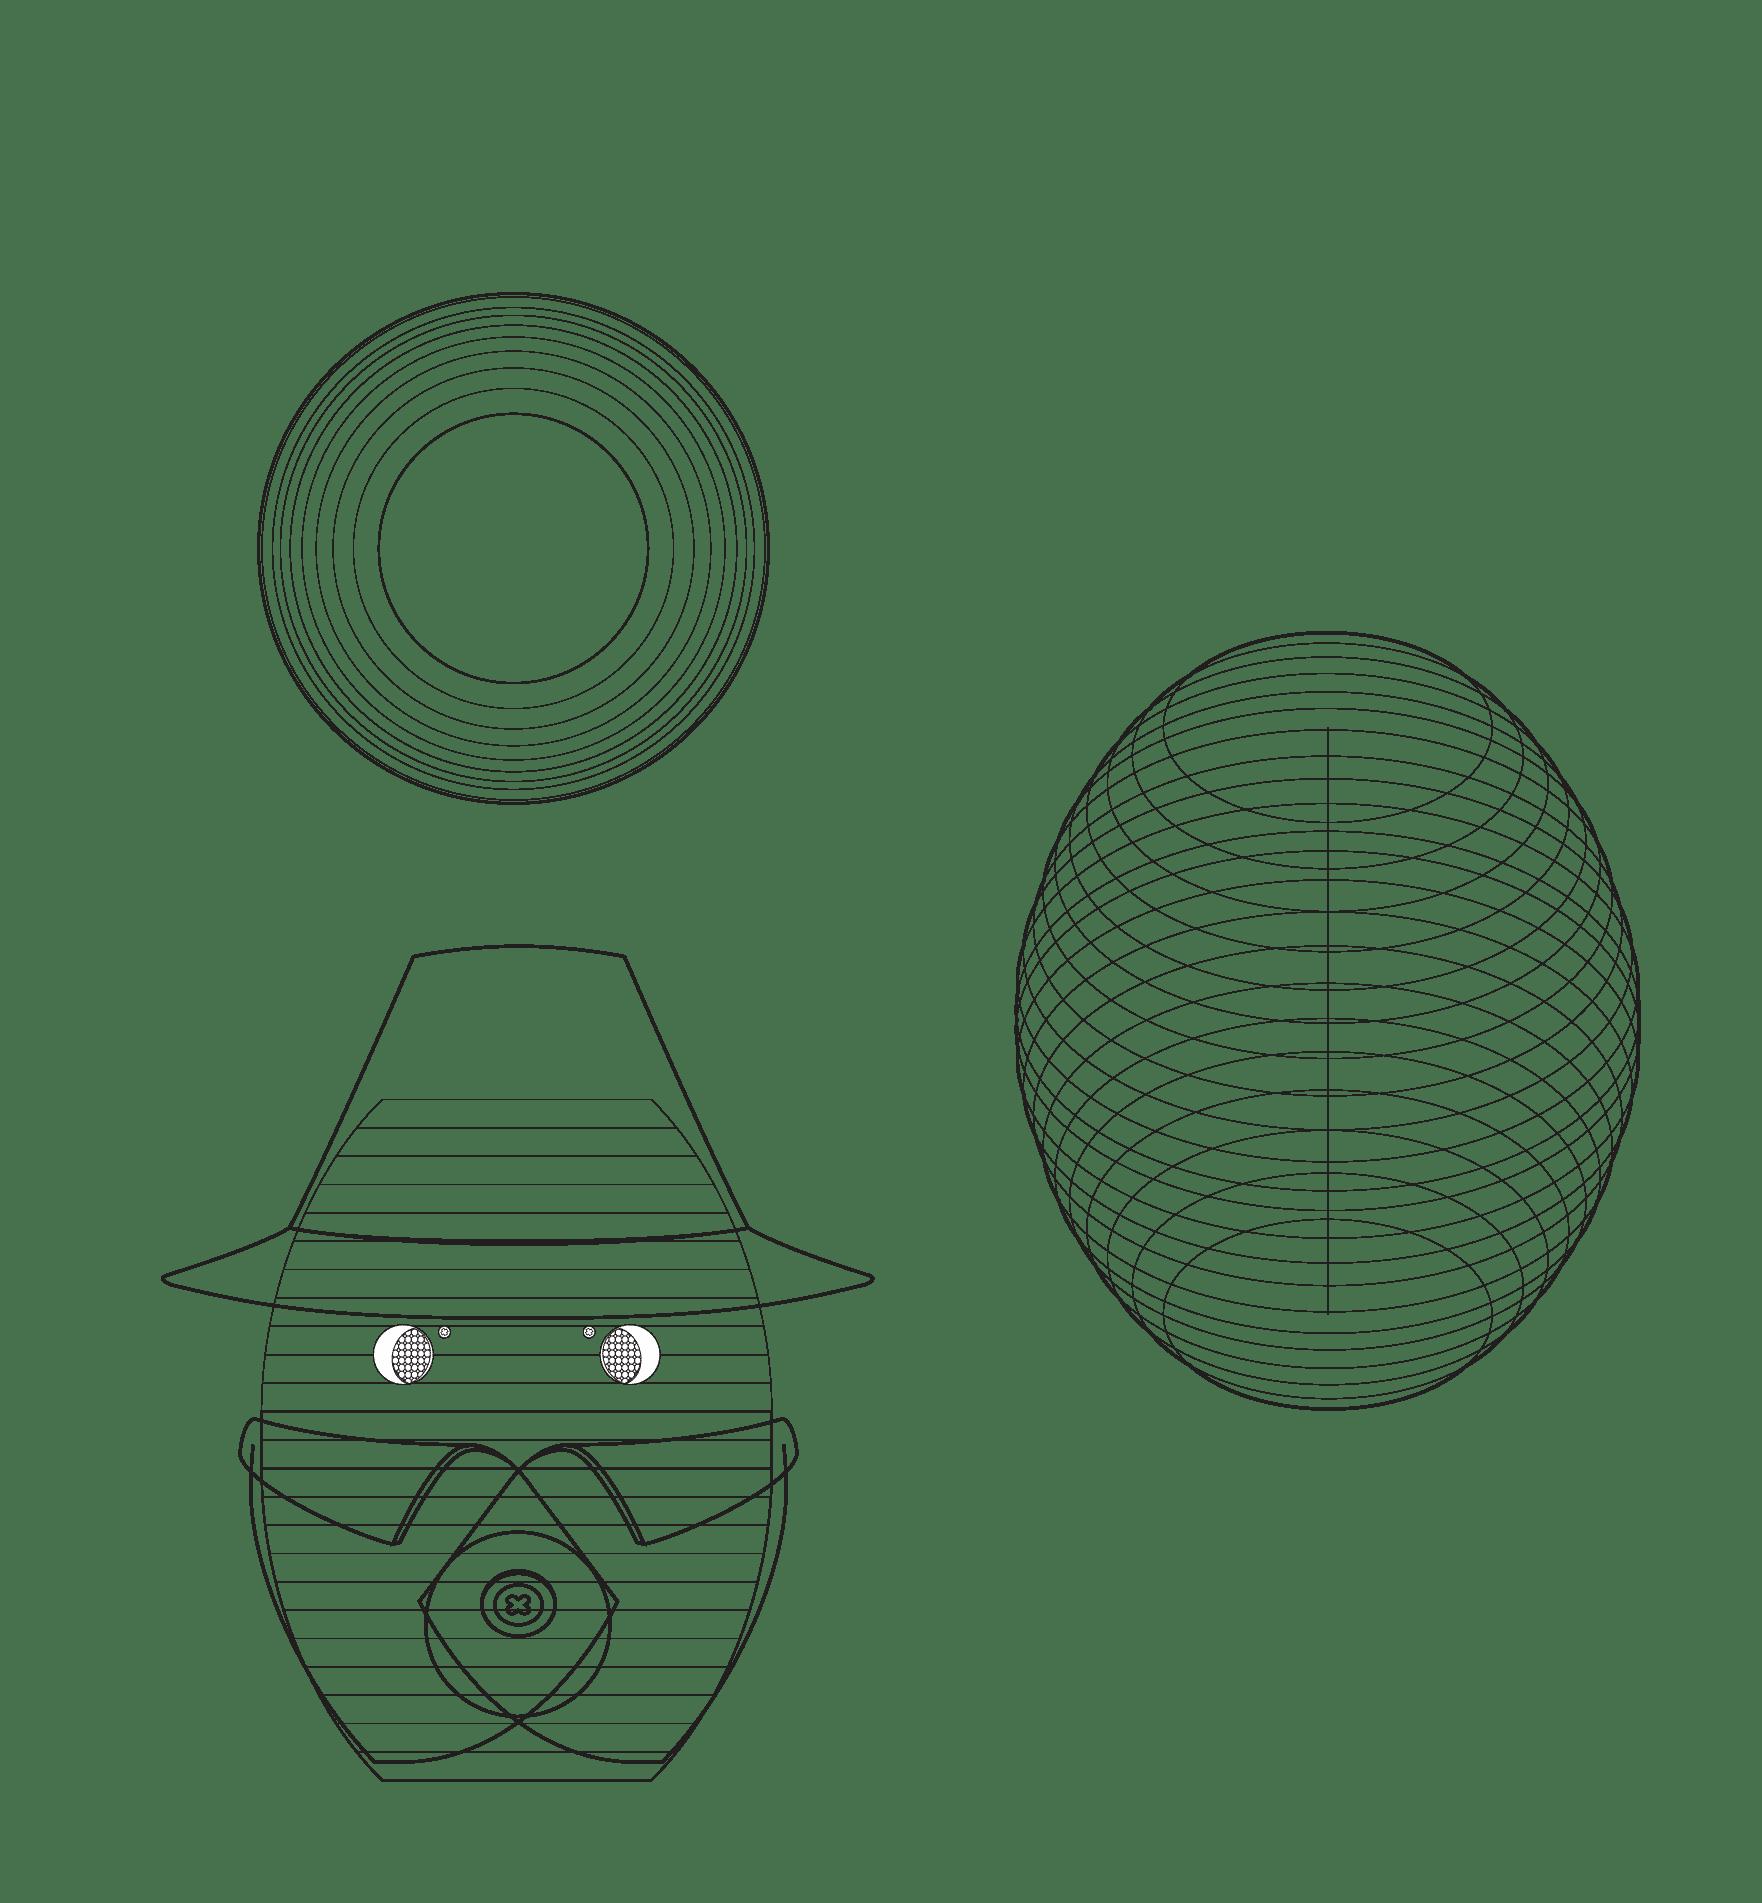 Robot embodiment sketch of Tessa